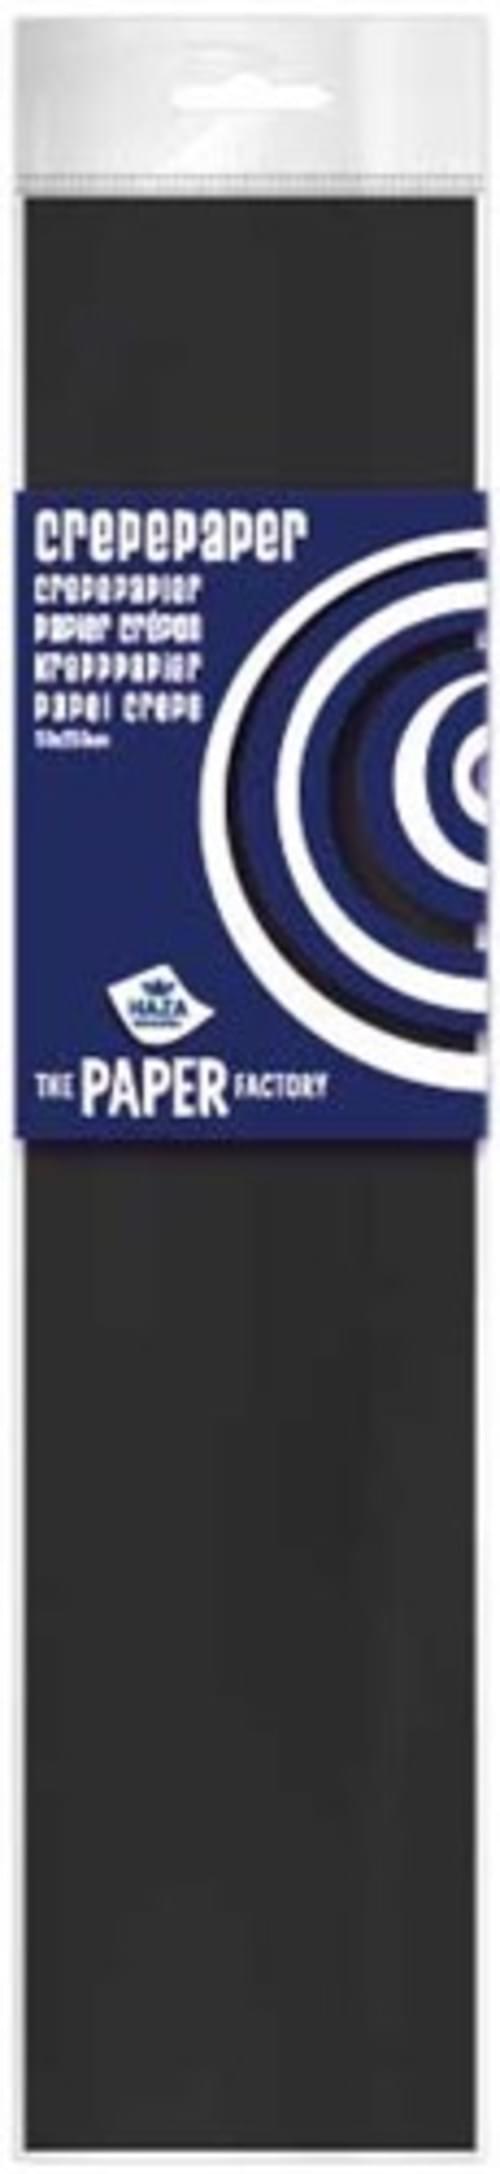 Crepe Paper Black  10pk